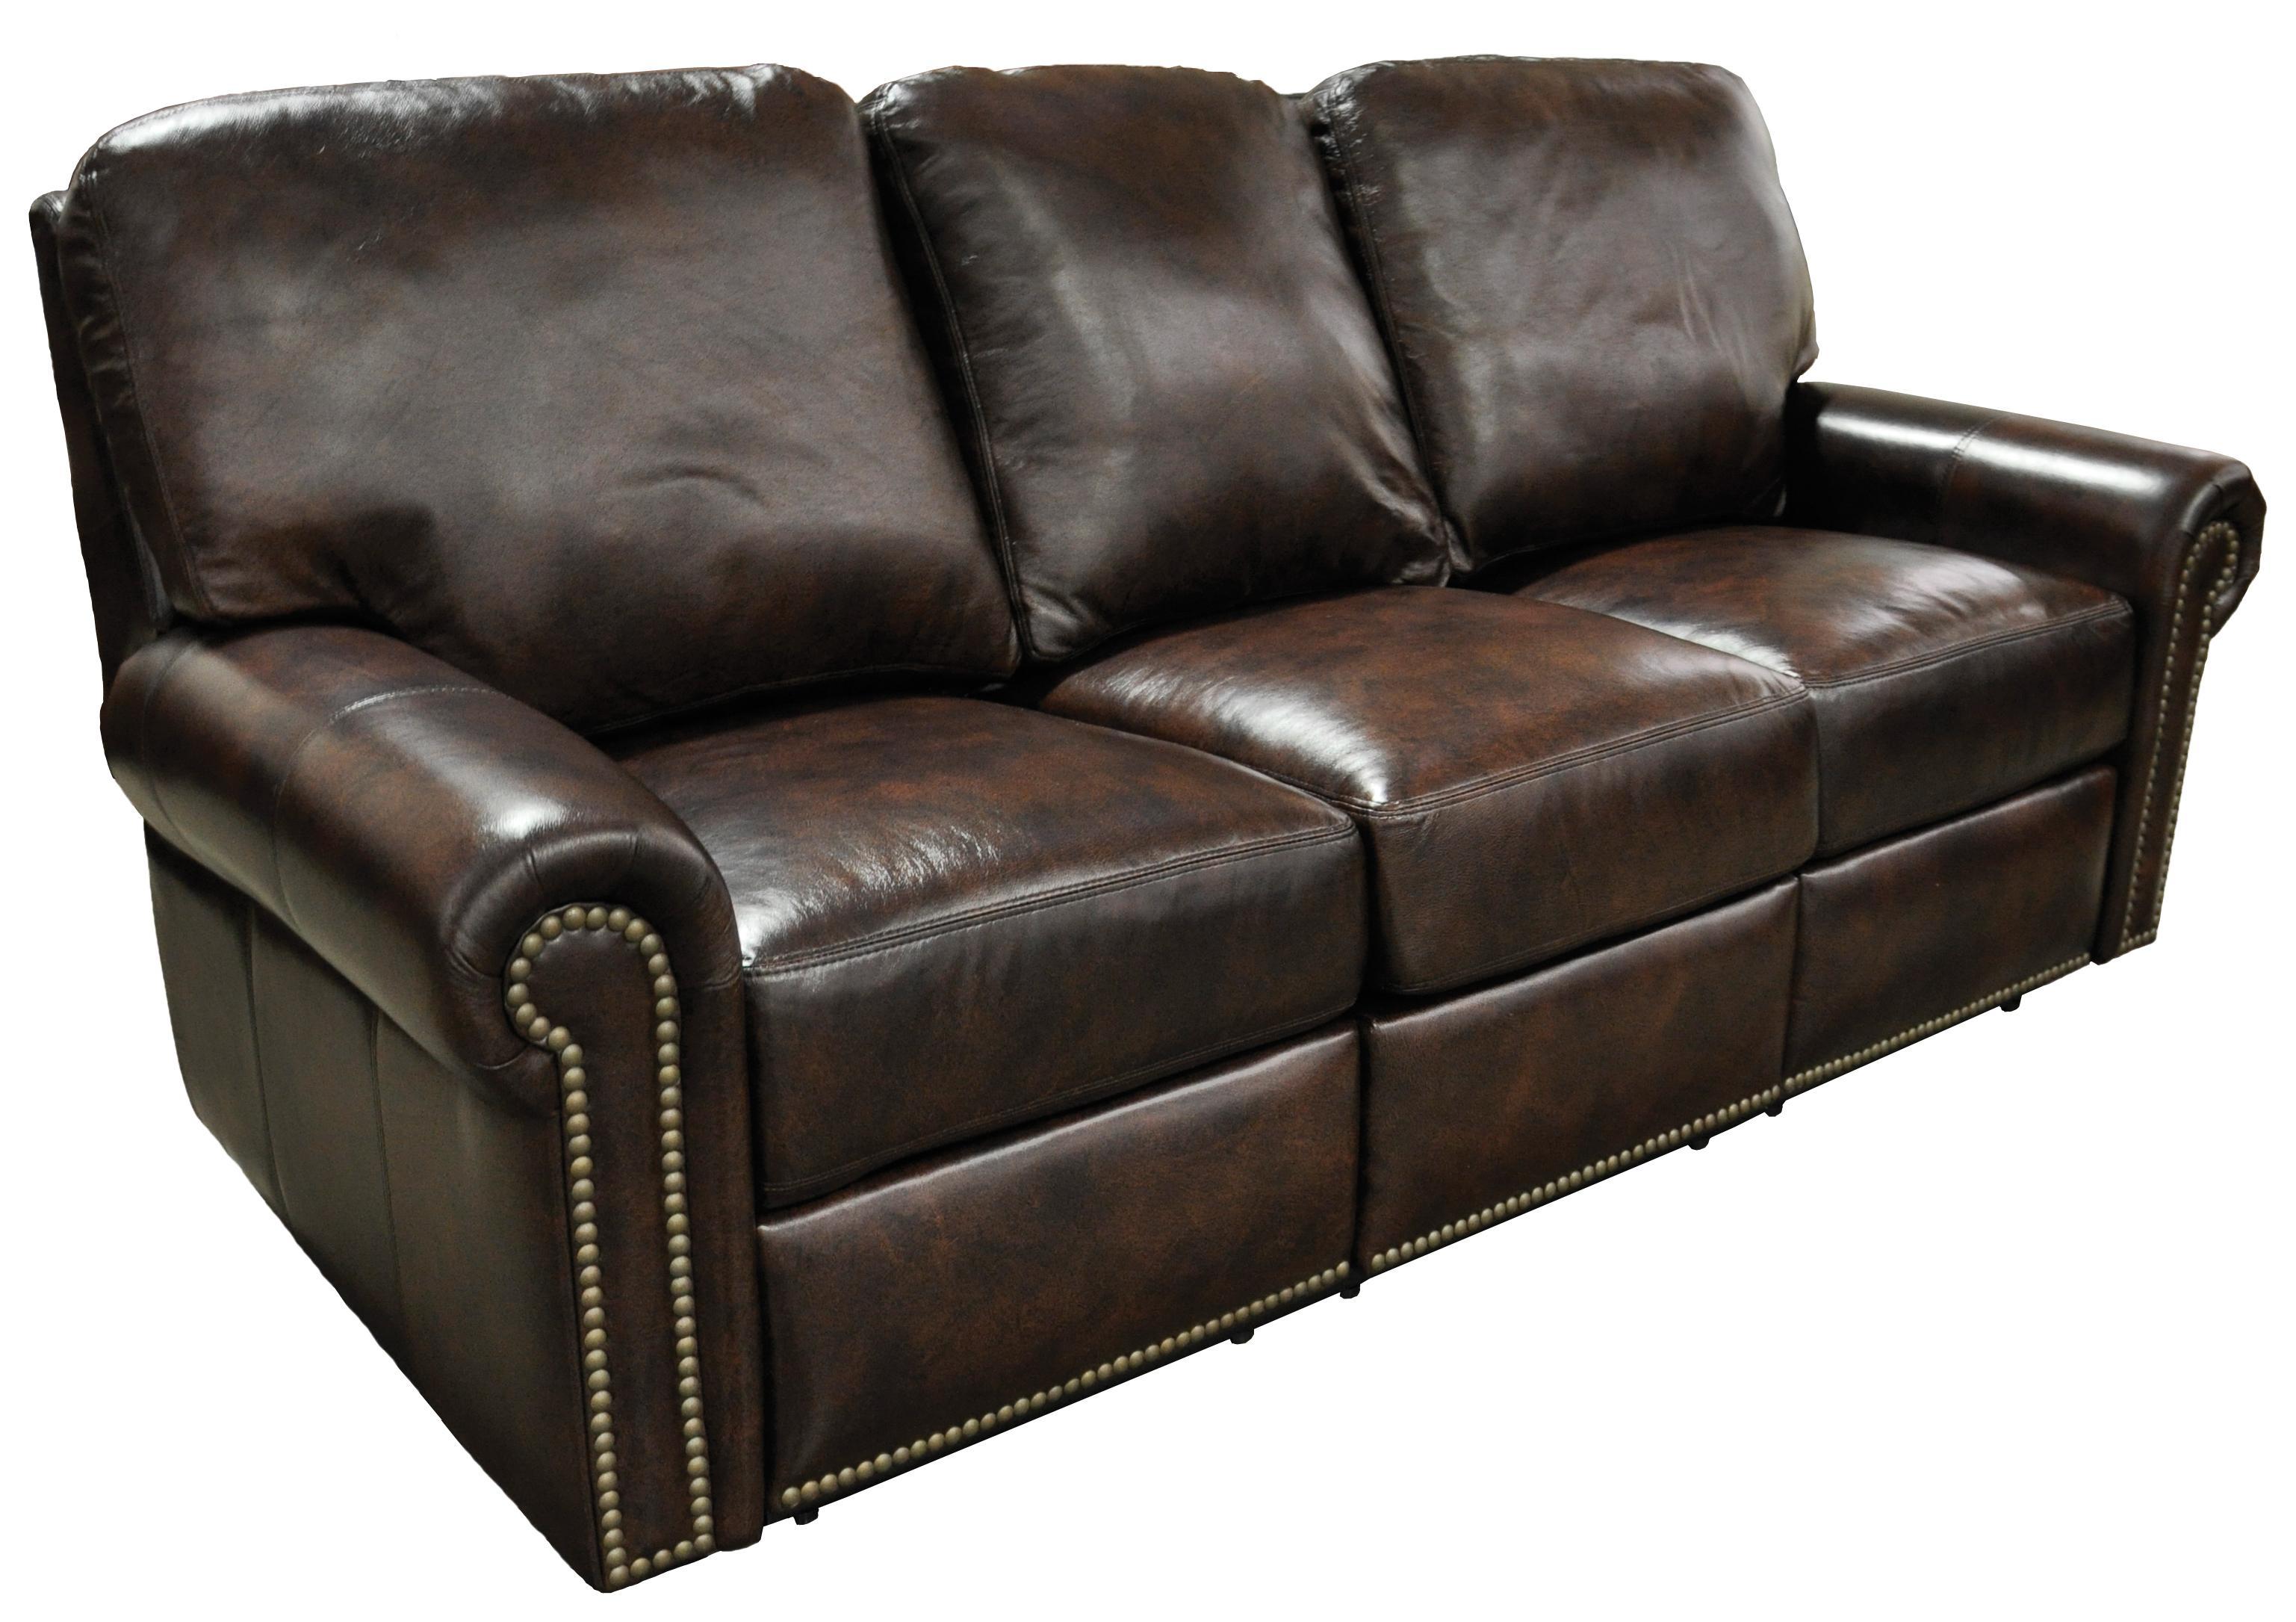 Sofas Center : Berkline Leather Reclinerofa Reviewset Costcoabine With Regard To Berkline Leather Recliner Sofas (View 10 of 20)